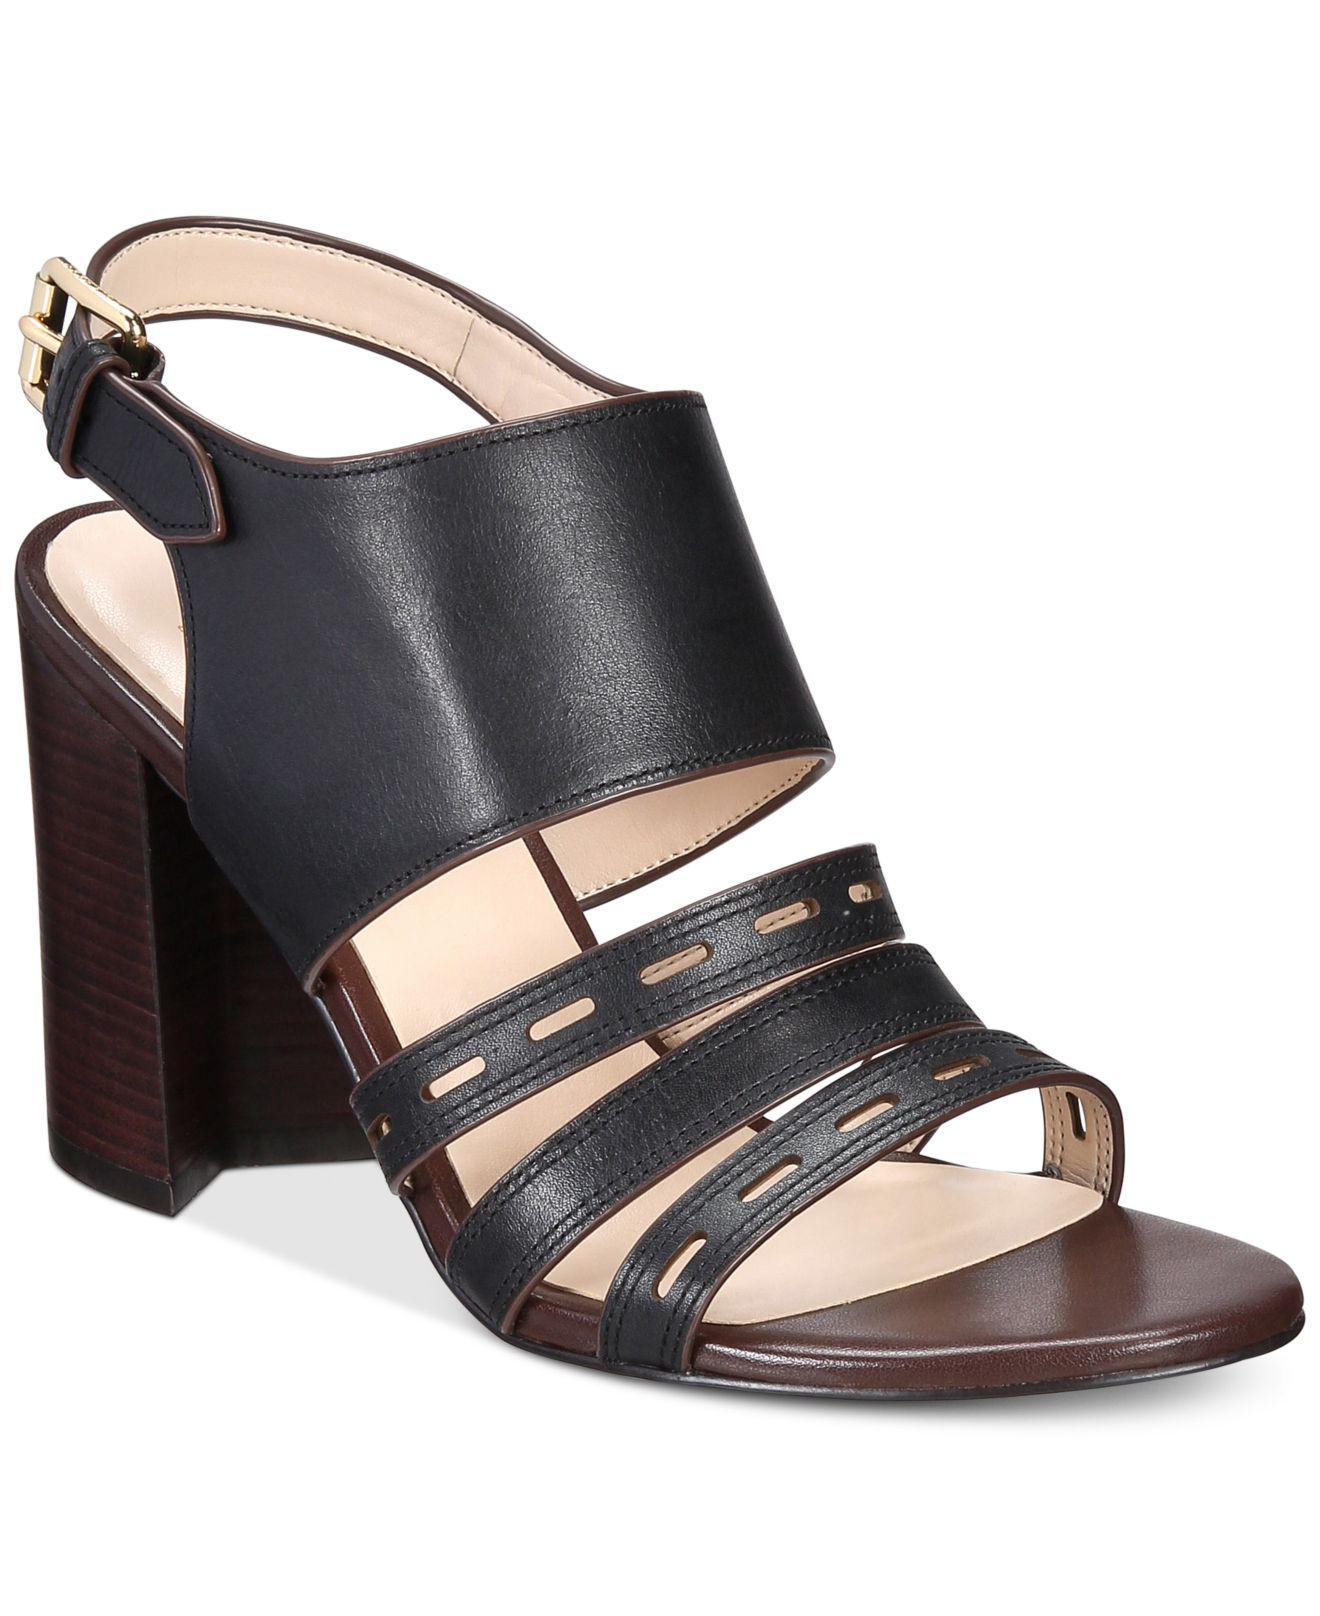 e9a736d1213 Lyst - Cole Haan Lavelle Block-heel Sandals